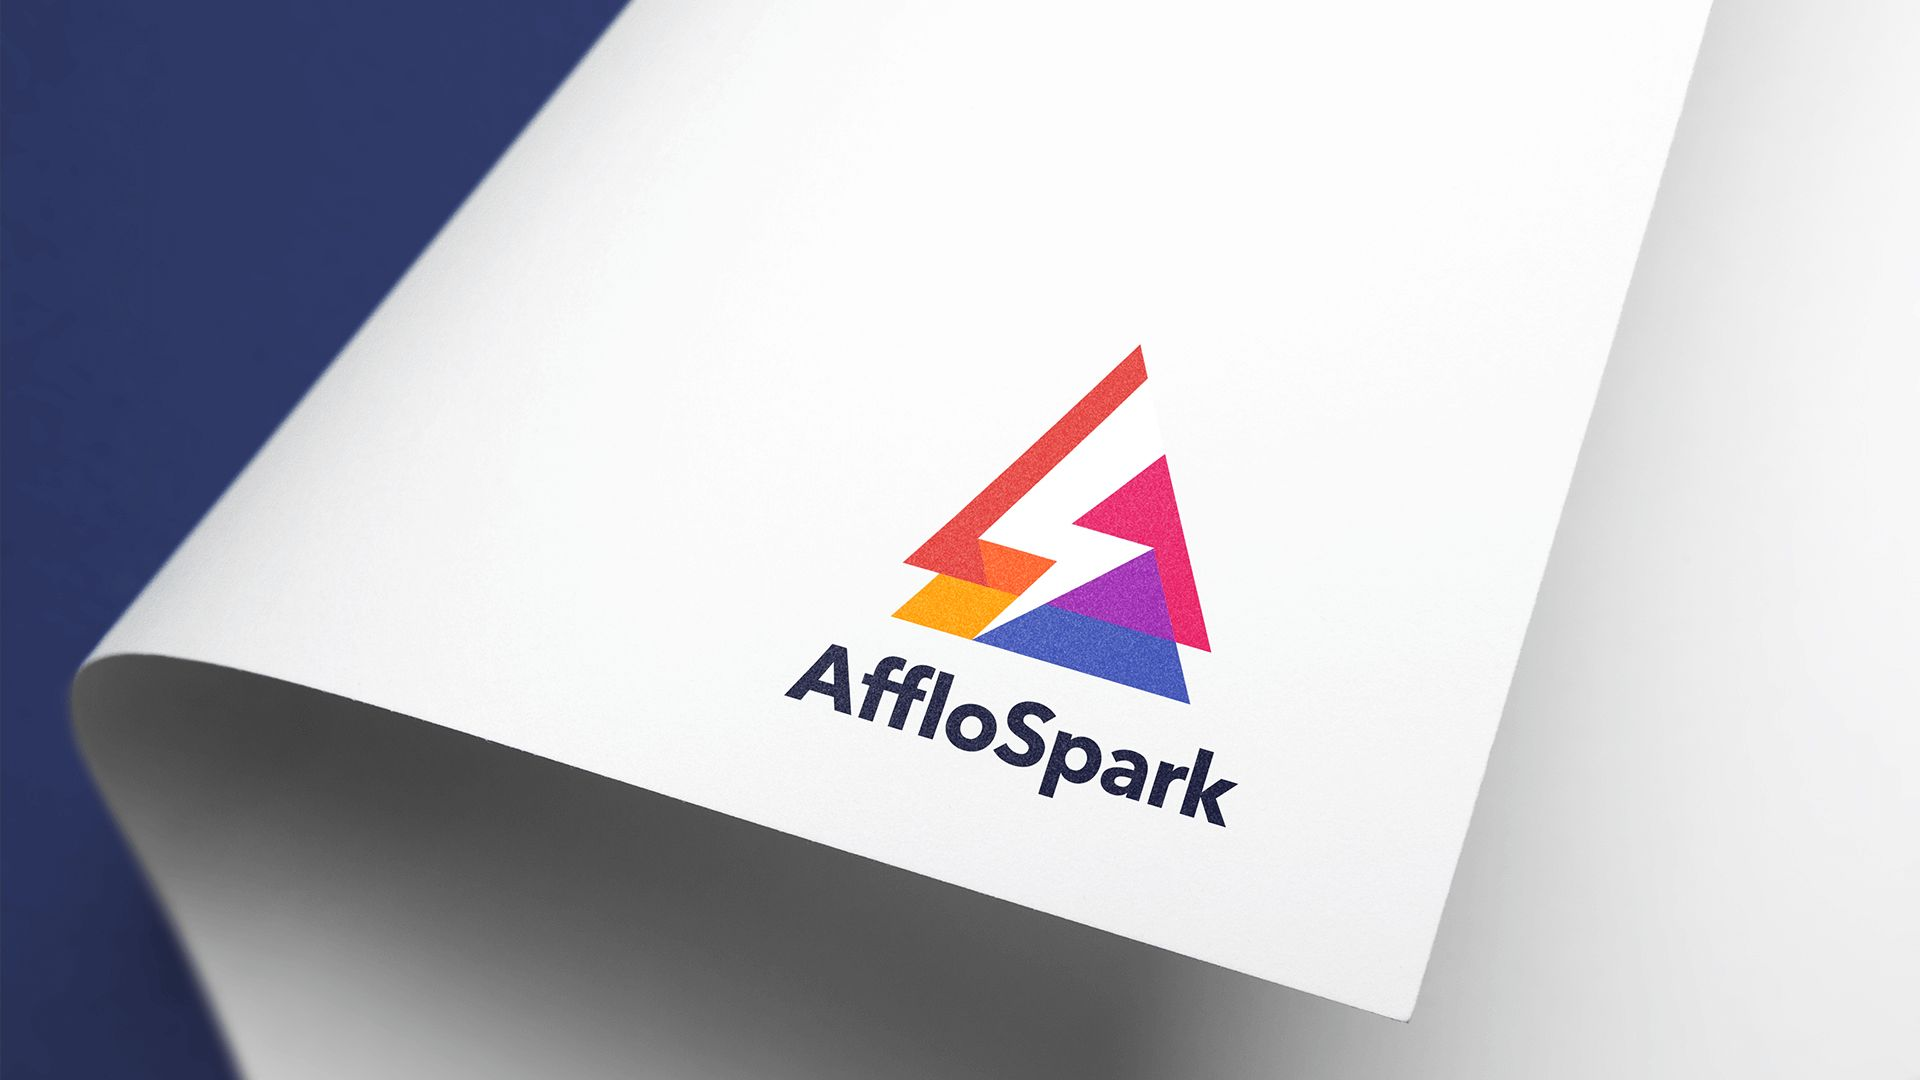 afflospark-content-writing